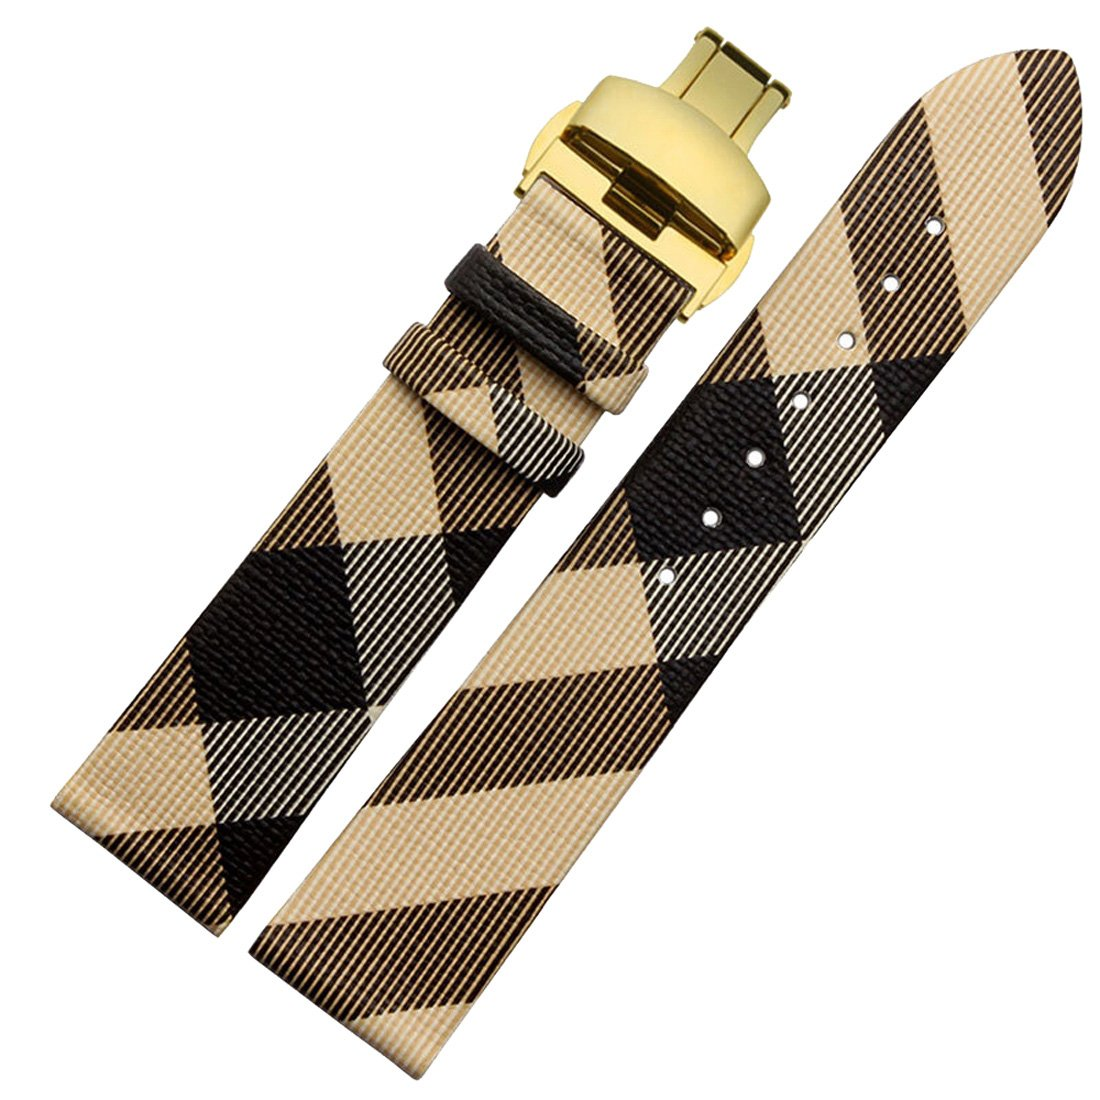 bolisi本革時計バンド交換用時計ストラップステンレスメタルクラスプ付きBurberry Watches 18mm Beige-gold B0757LVG74 18mm|Beige-gold Beige-gold 18mm